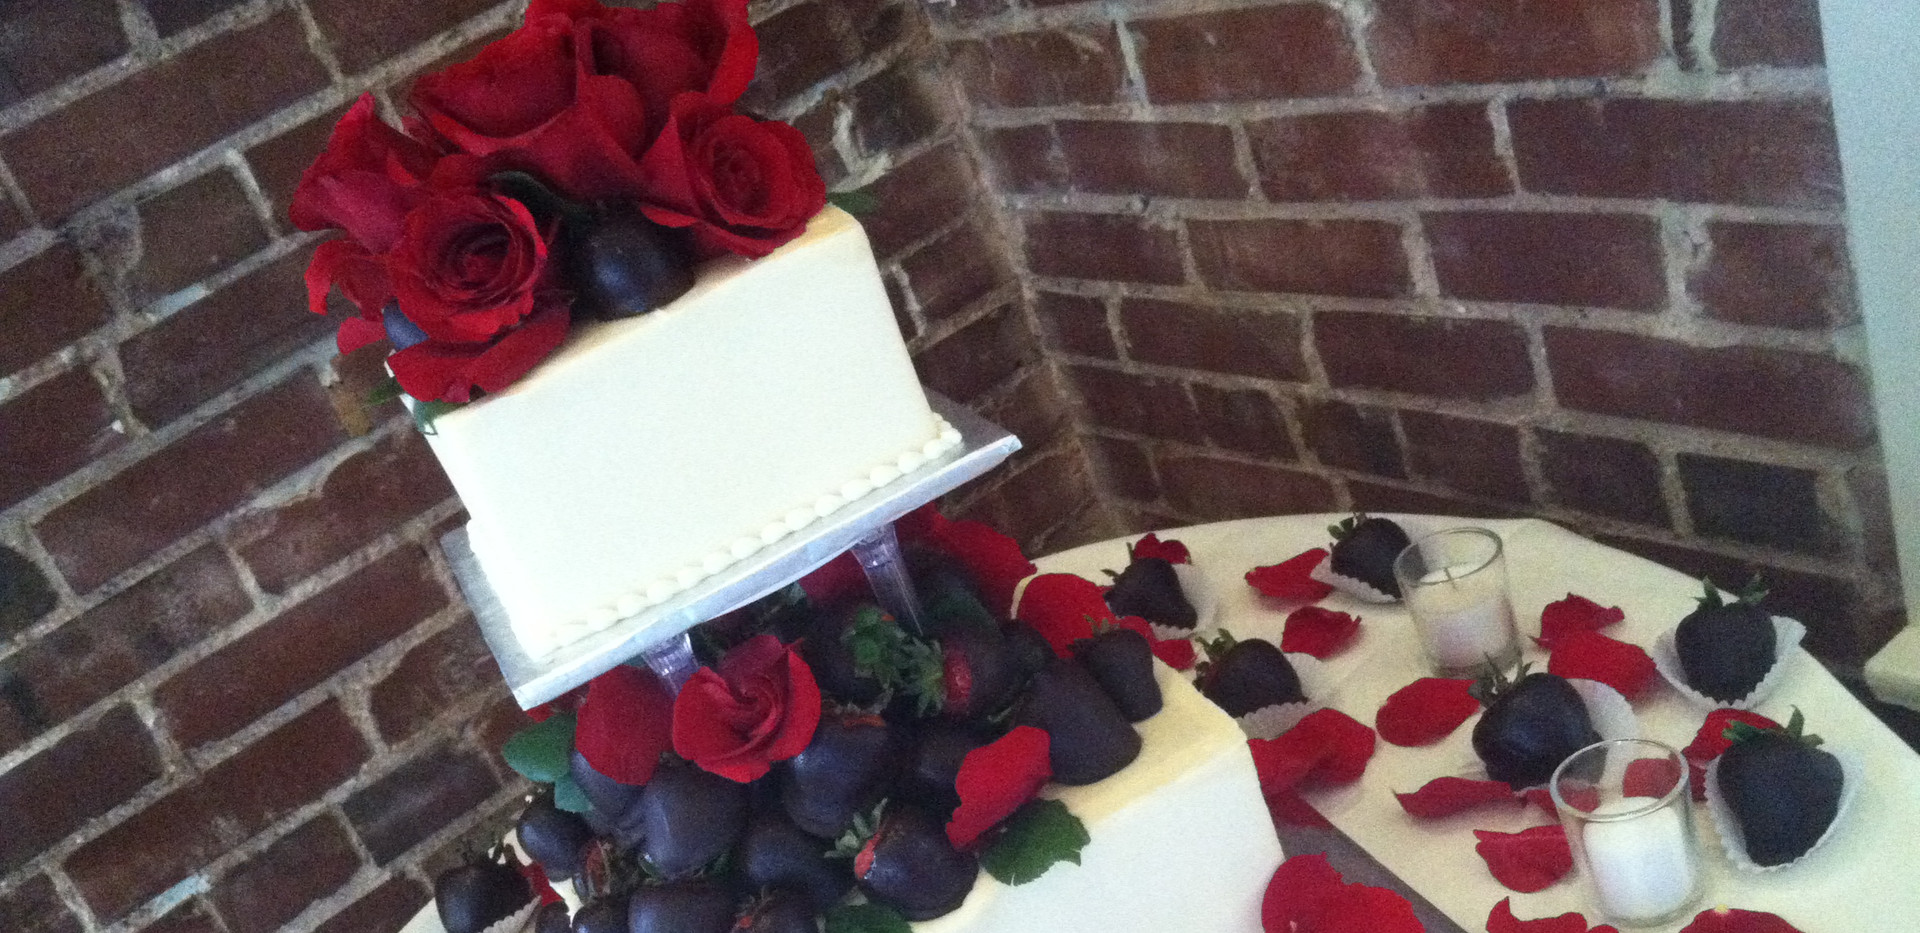 2-Tiered Wedding cake